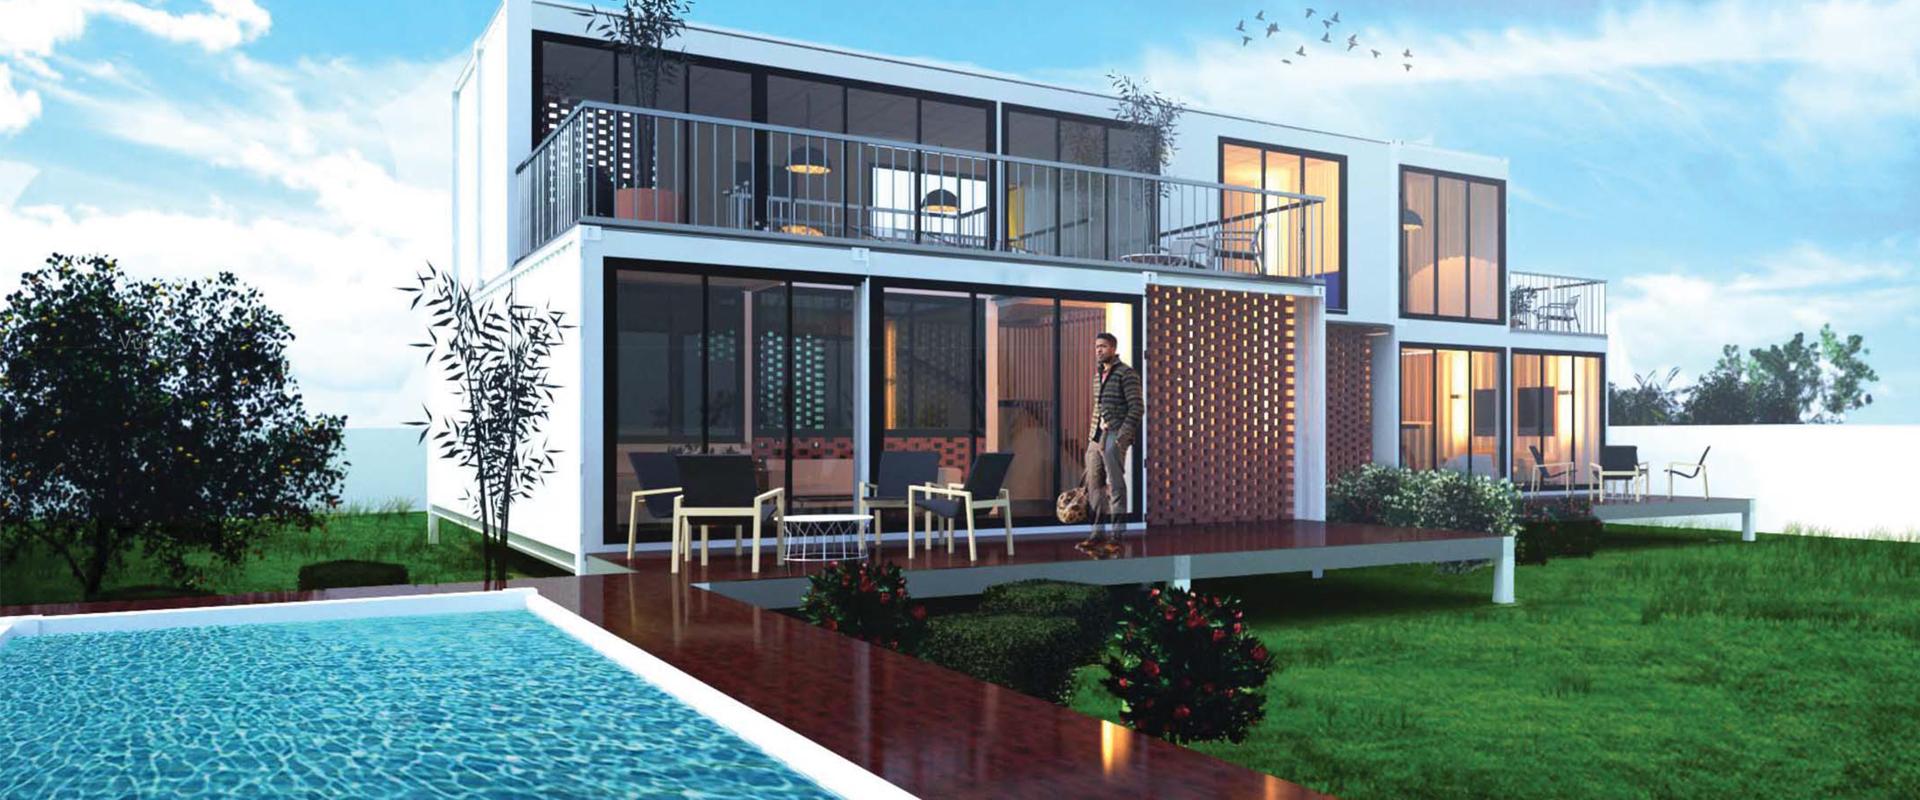 Villa Double J_Barla_barla_architectes_douala_cameroun